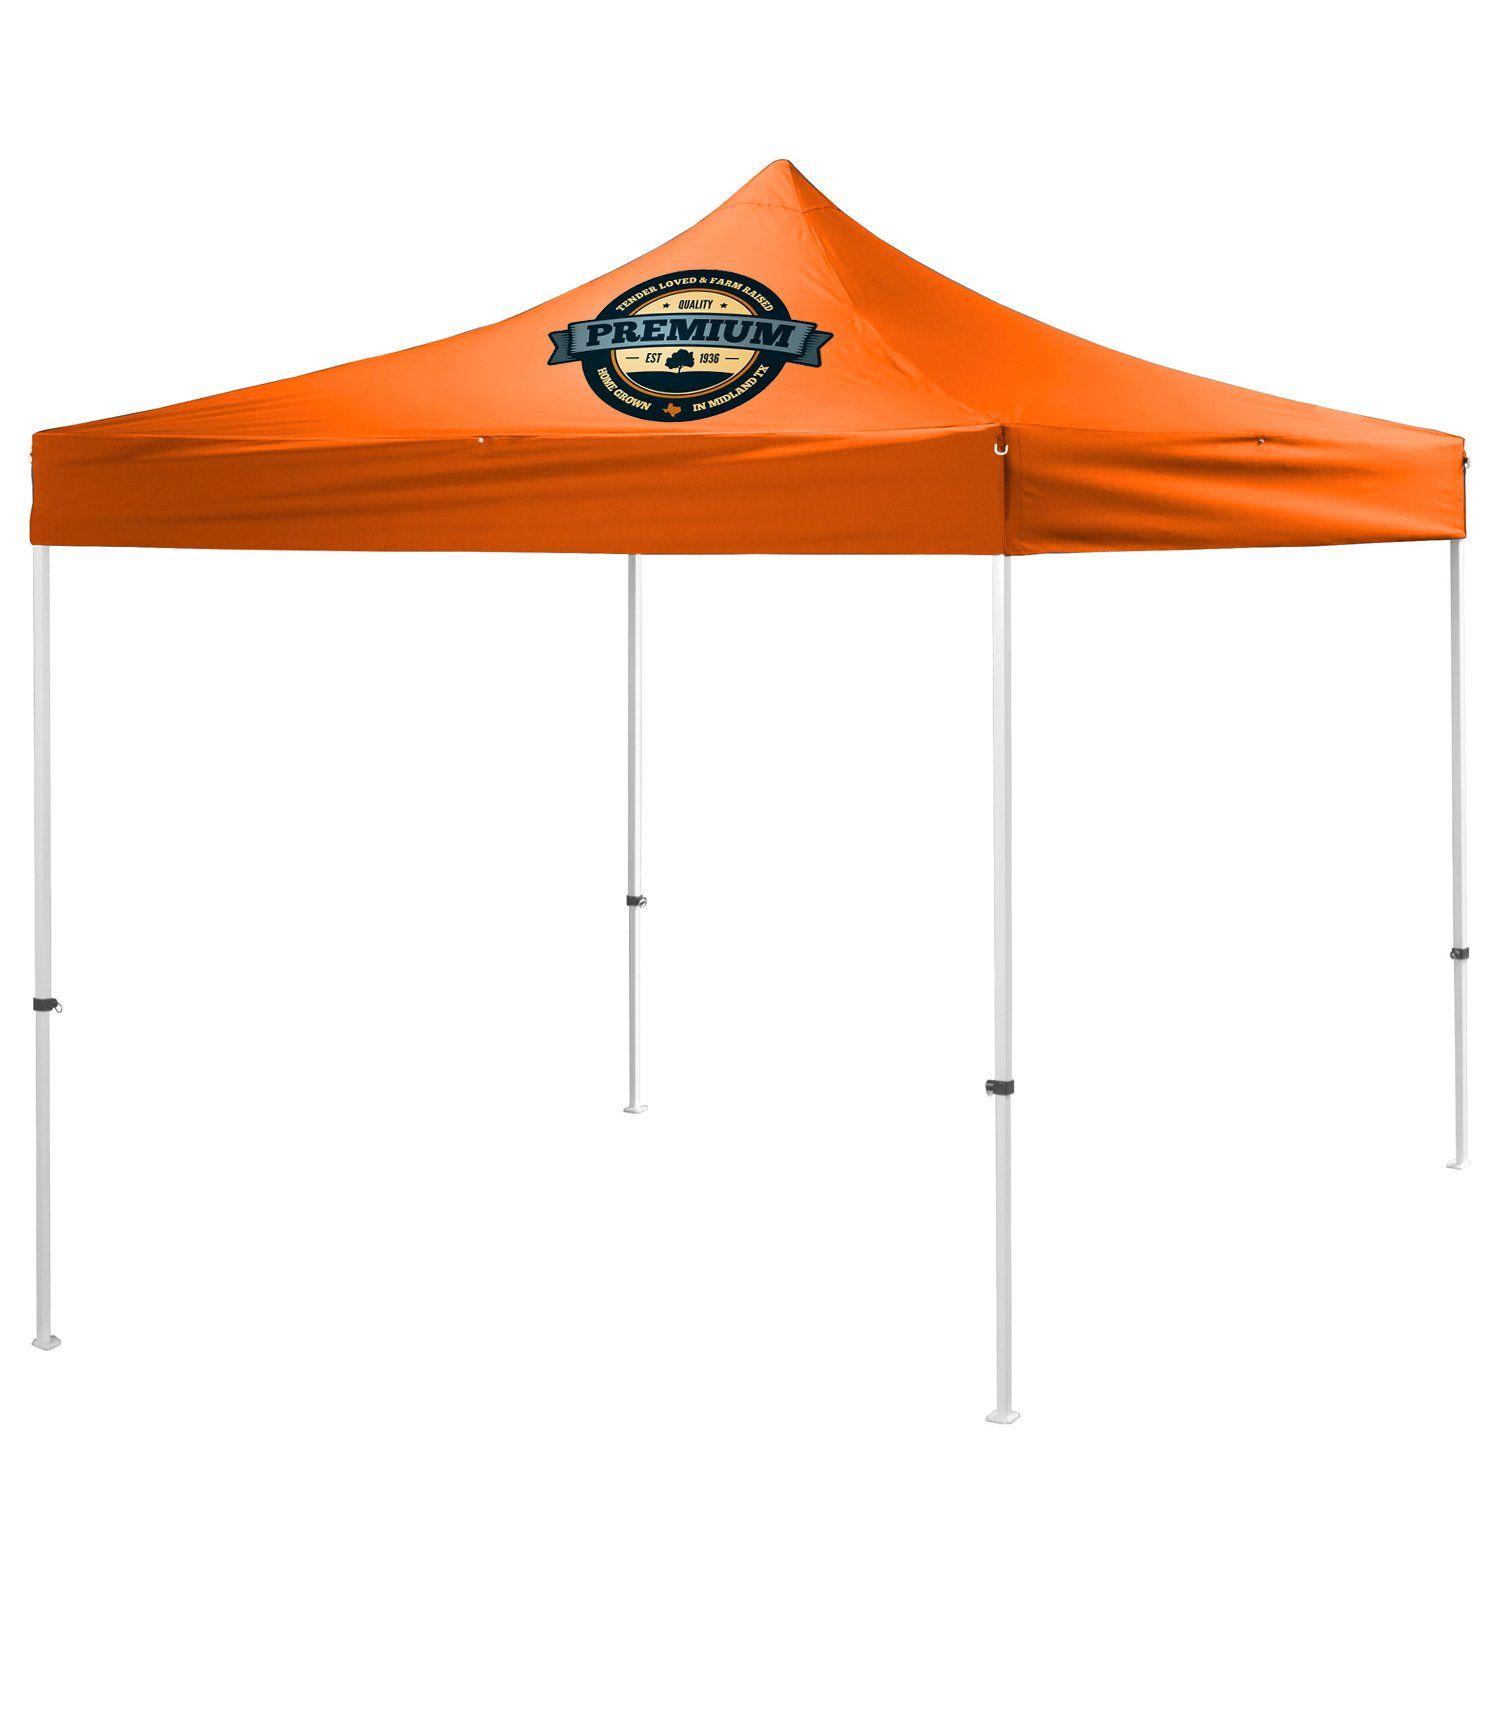 Canopy